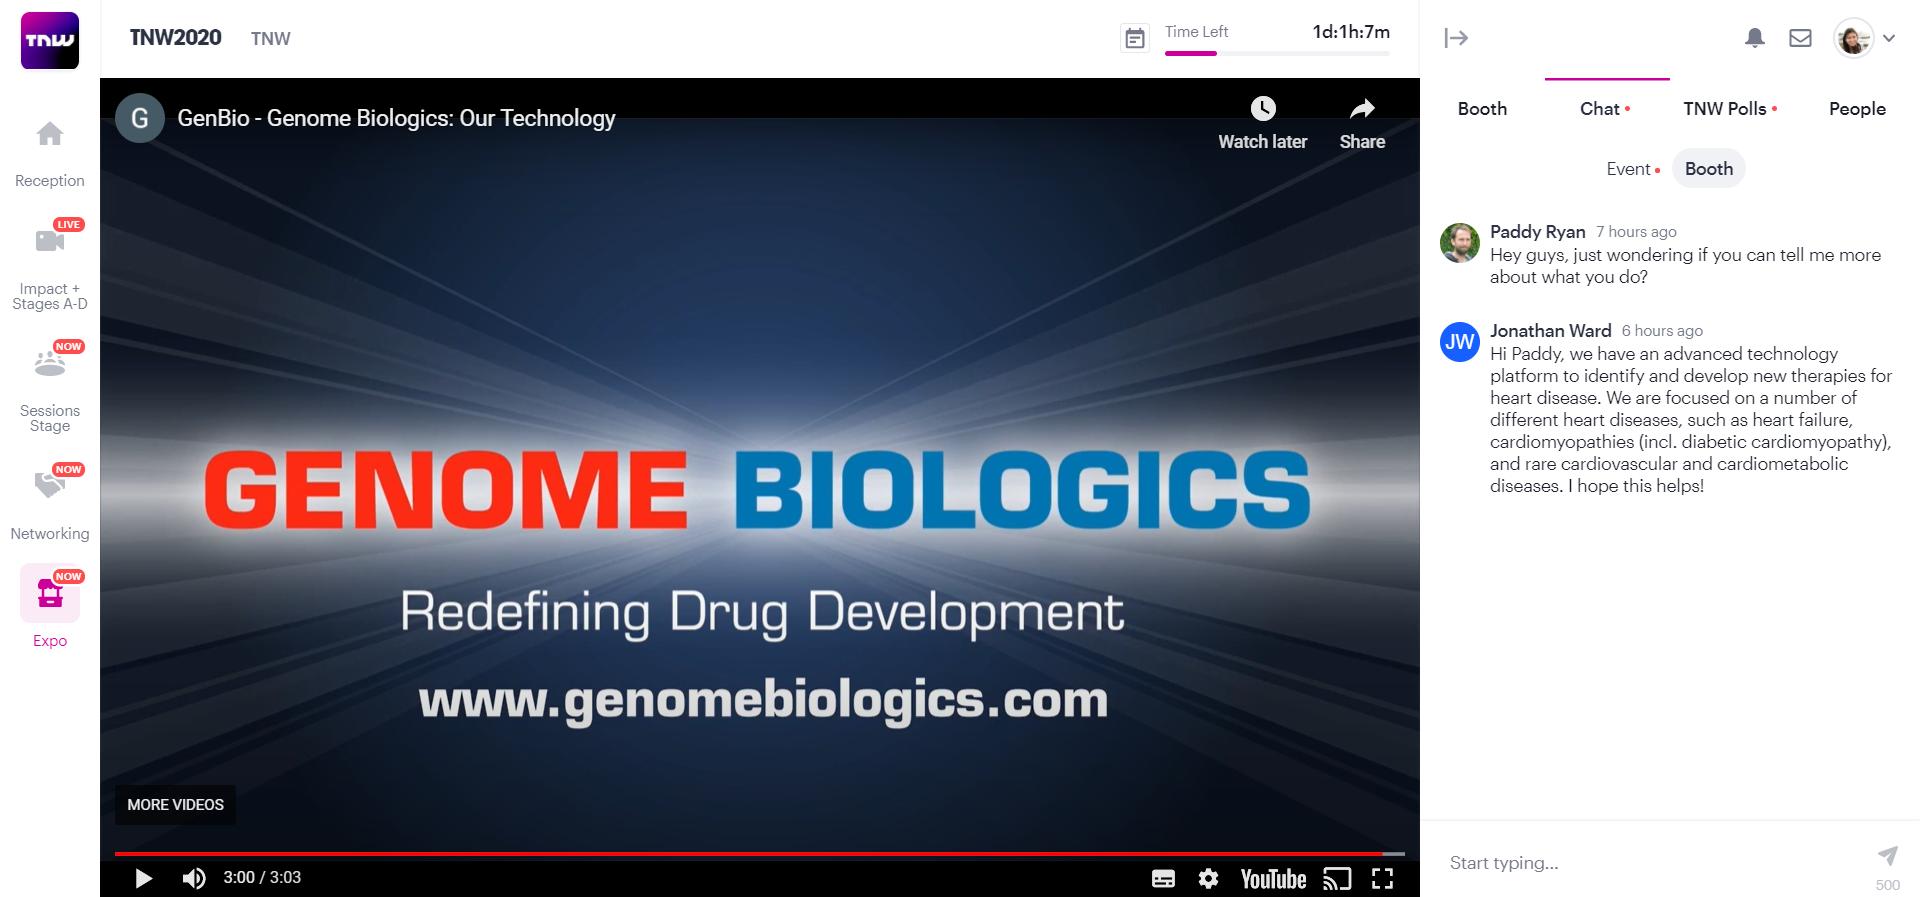 Genome Biologic 2